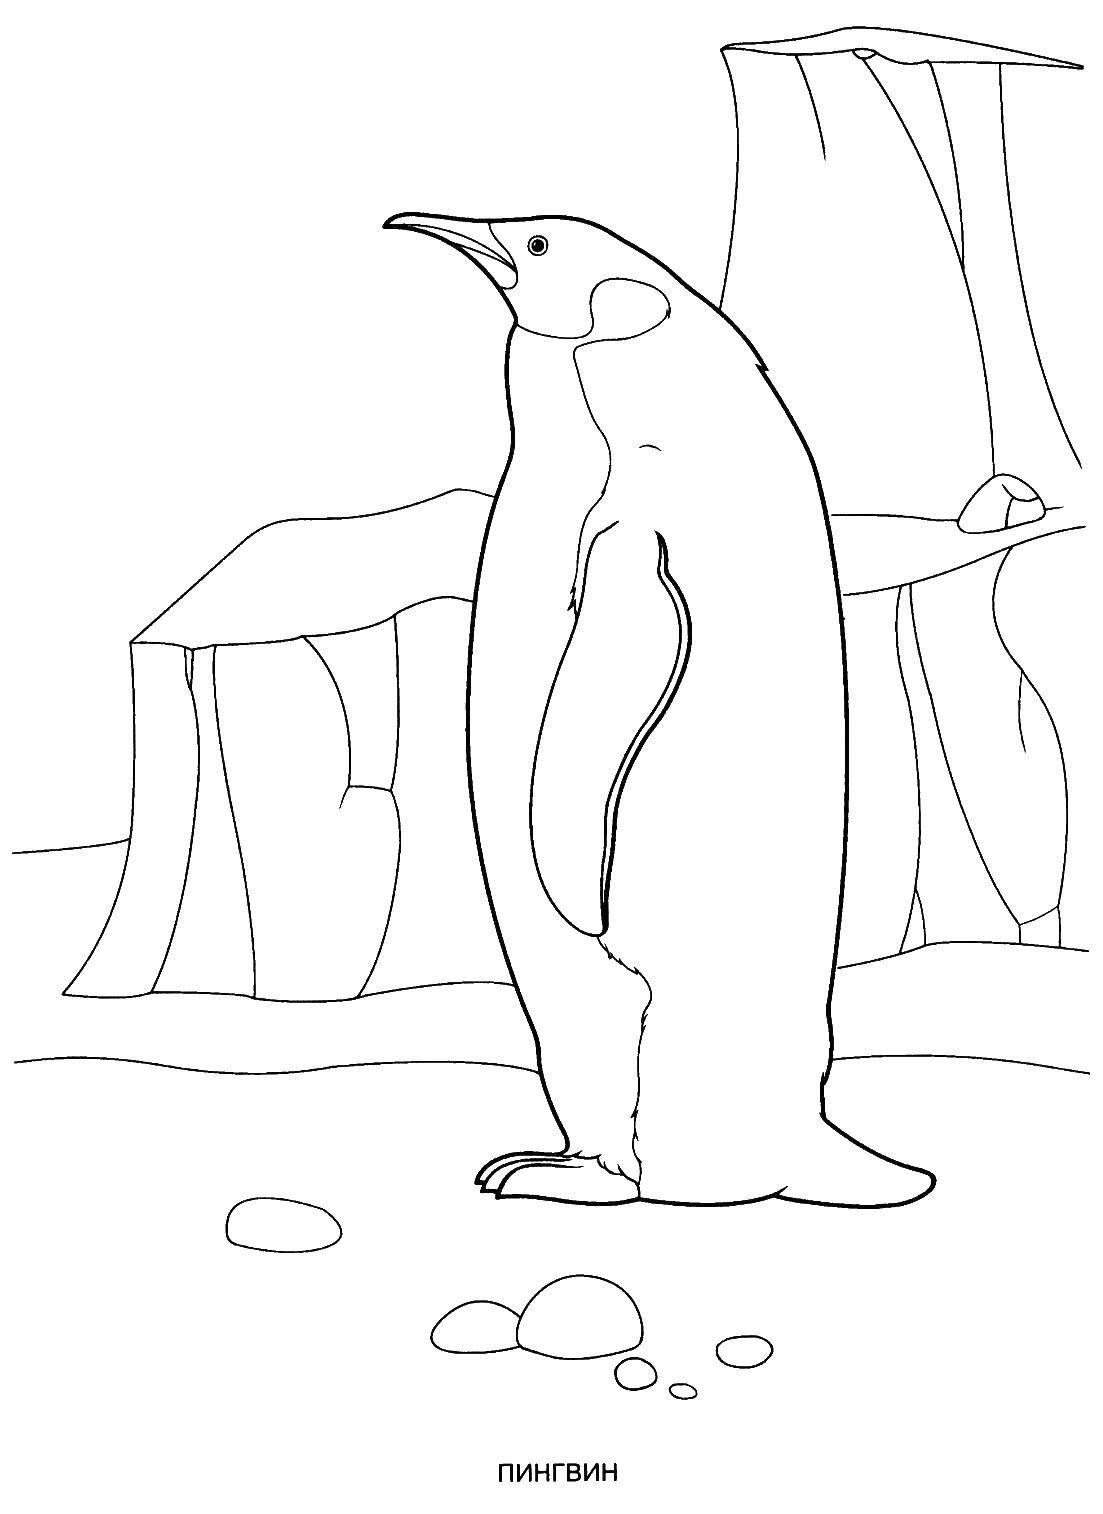 Coloring sheet penguin Download ,cartoons, children,.  Print